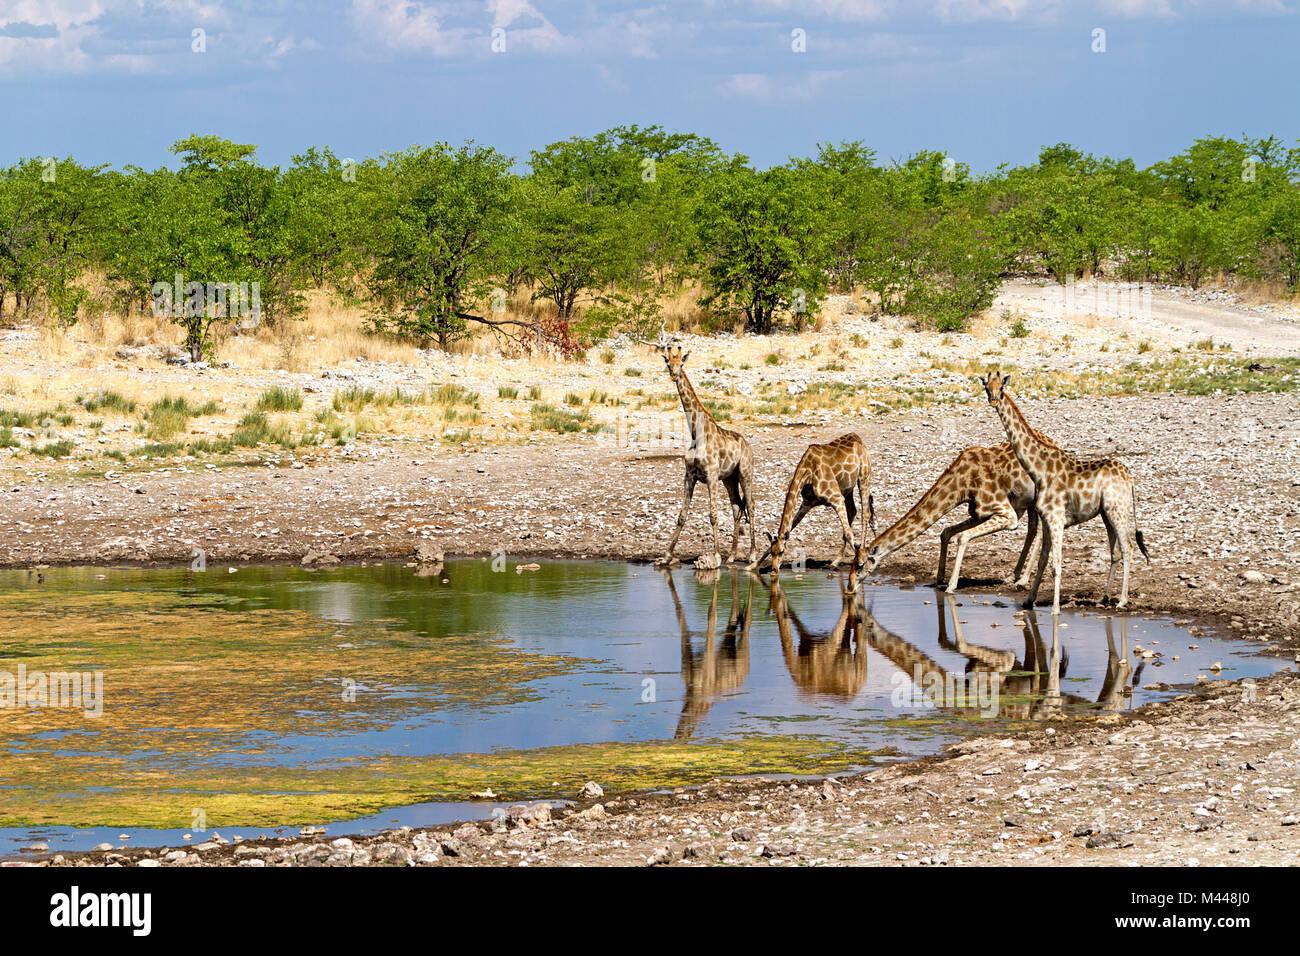 Etosha National Park - Giraffe at the waterhole - Stock Image